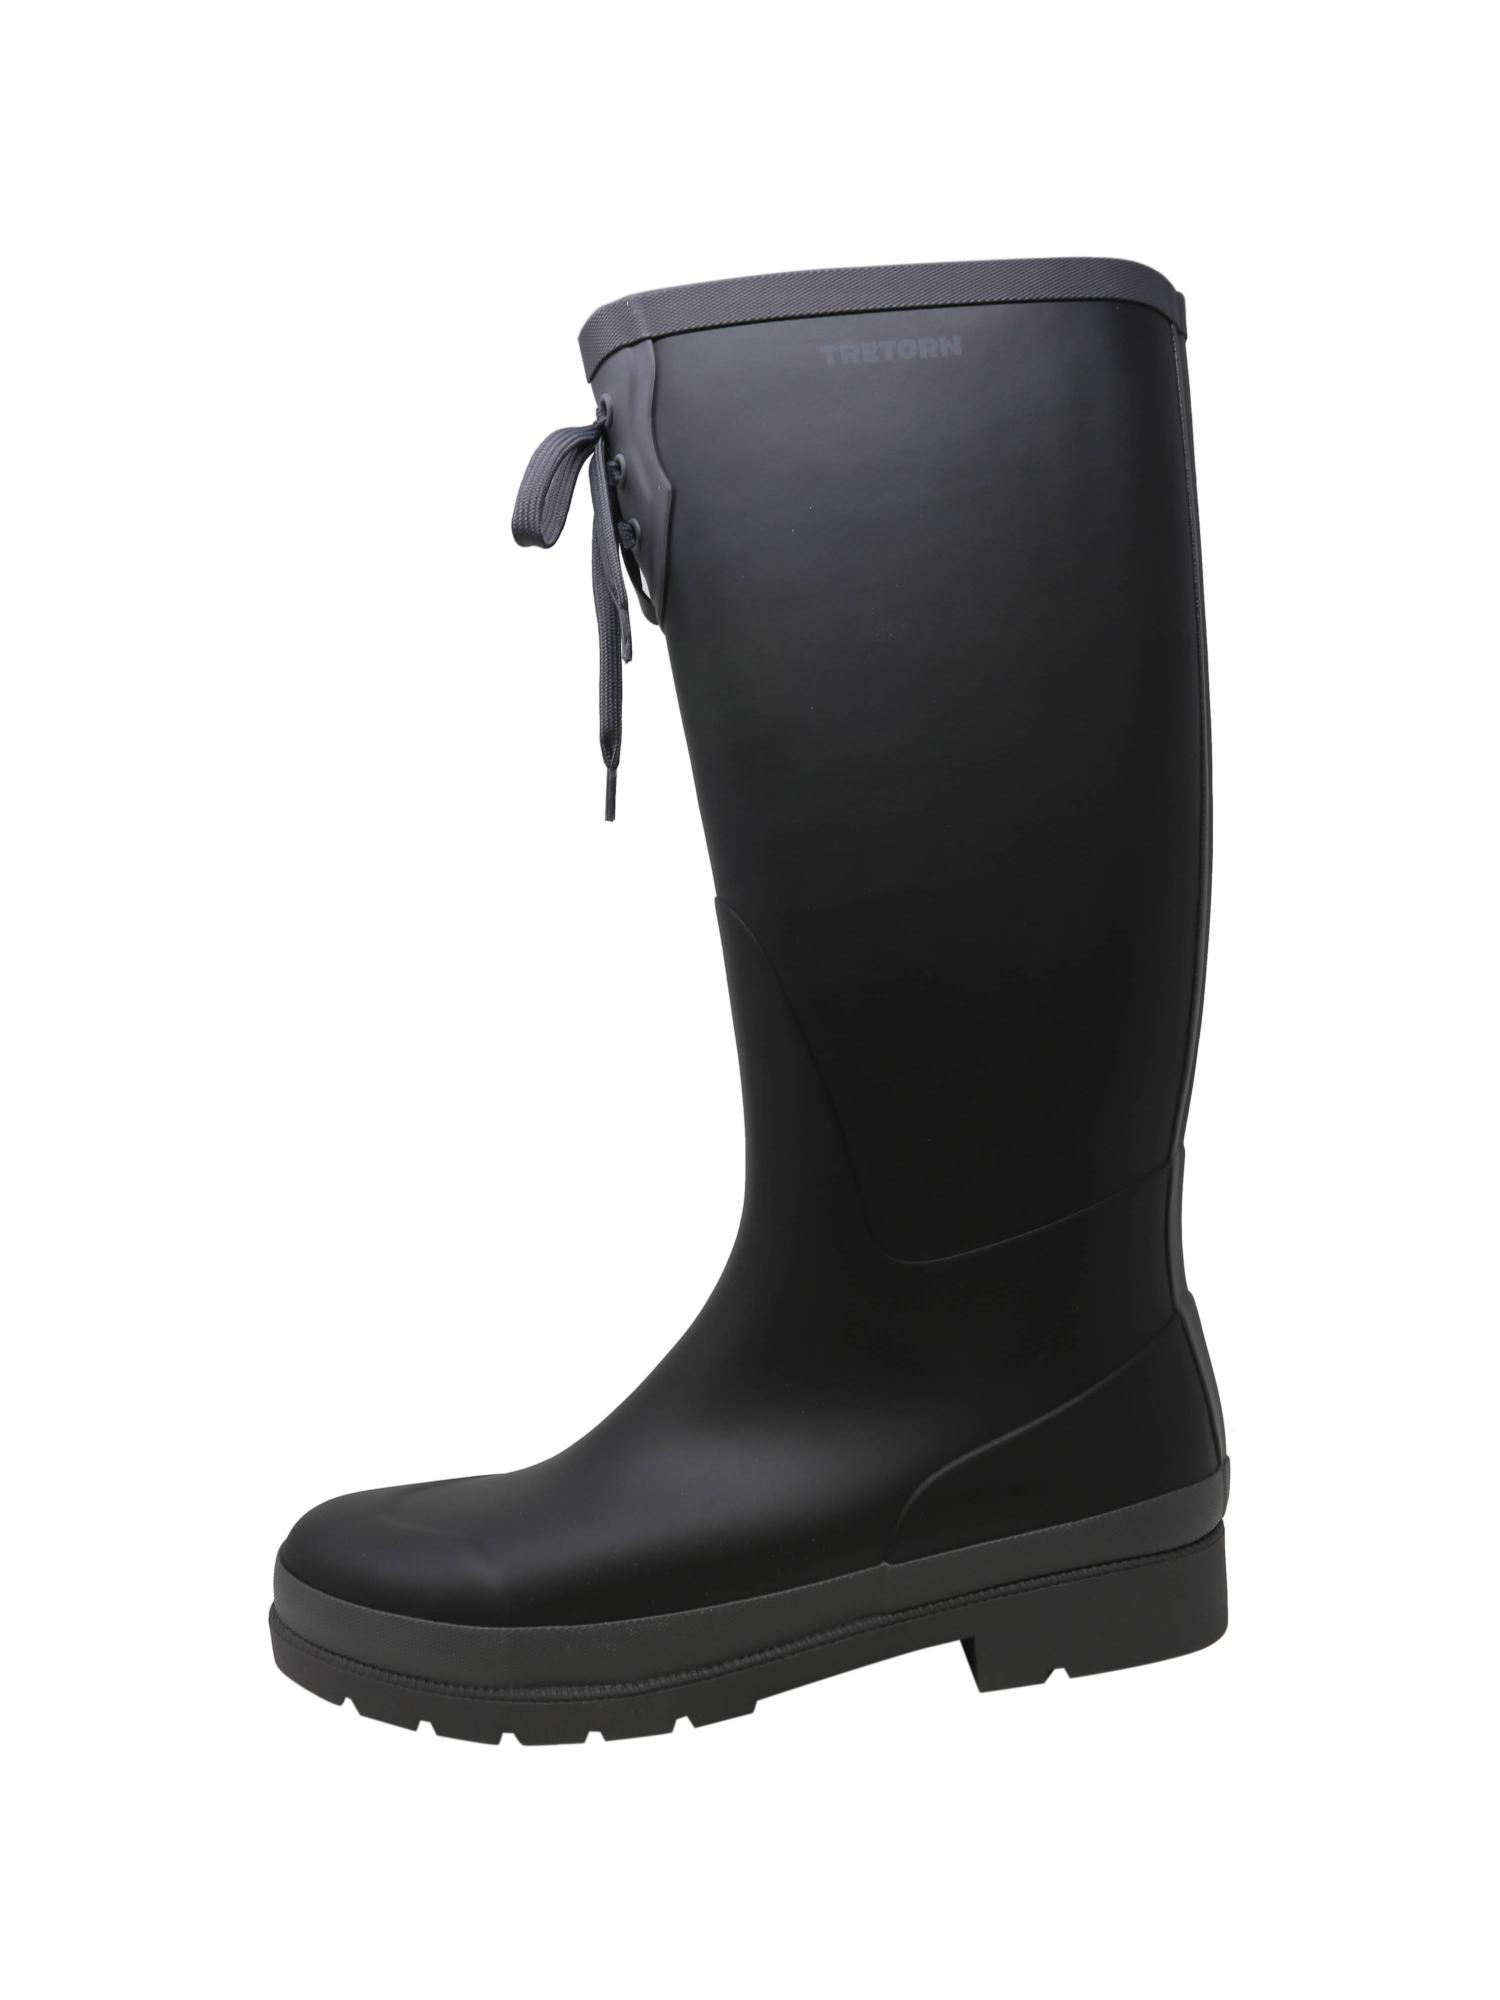 Tretorn-Women-039-s-Lacey-Rubber-Knee-High-Rain-Boot thumbnail 5